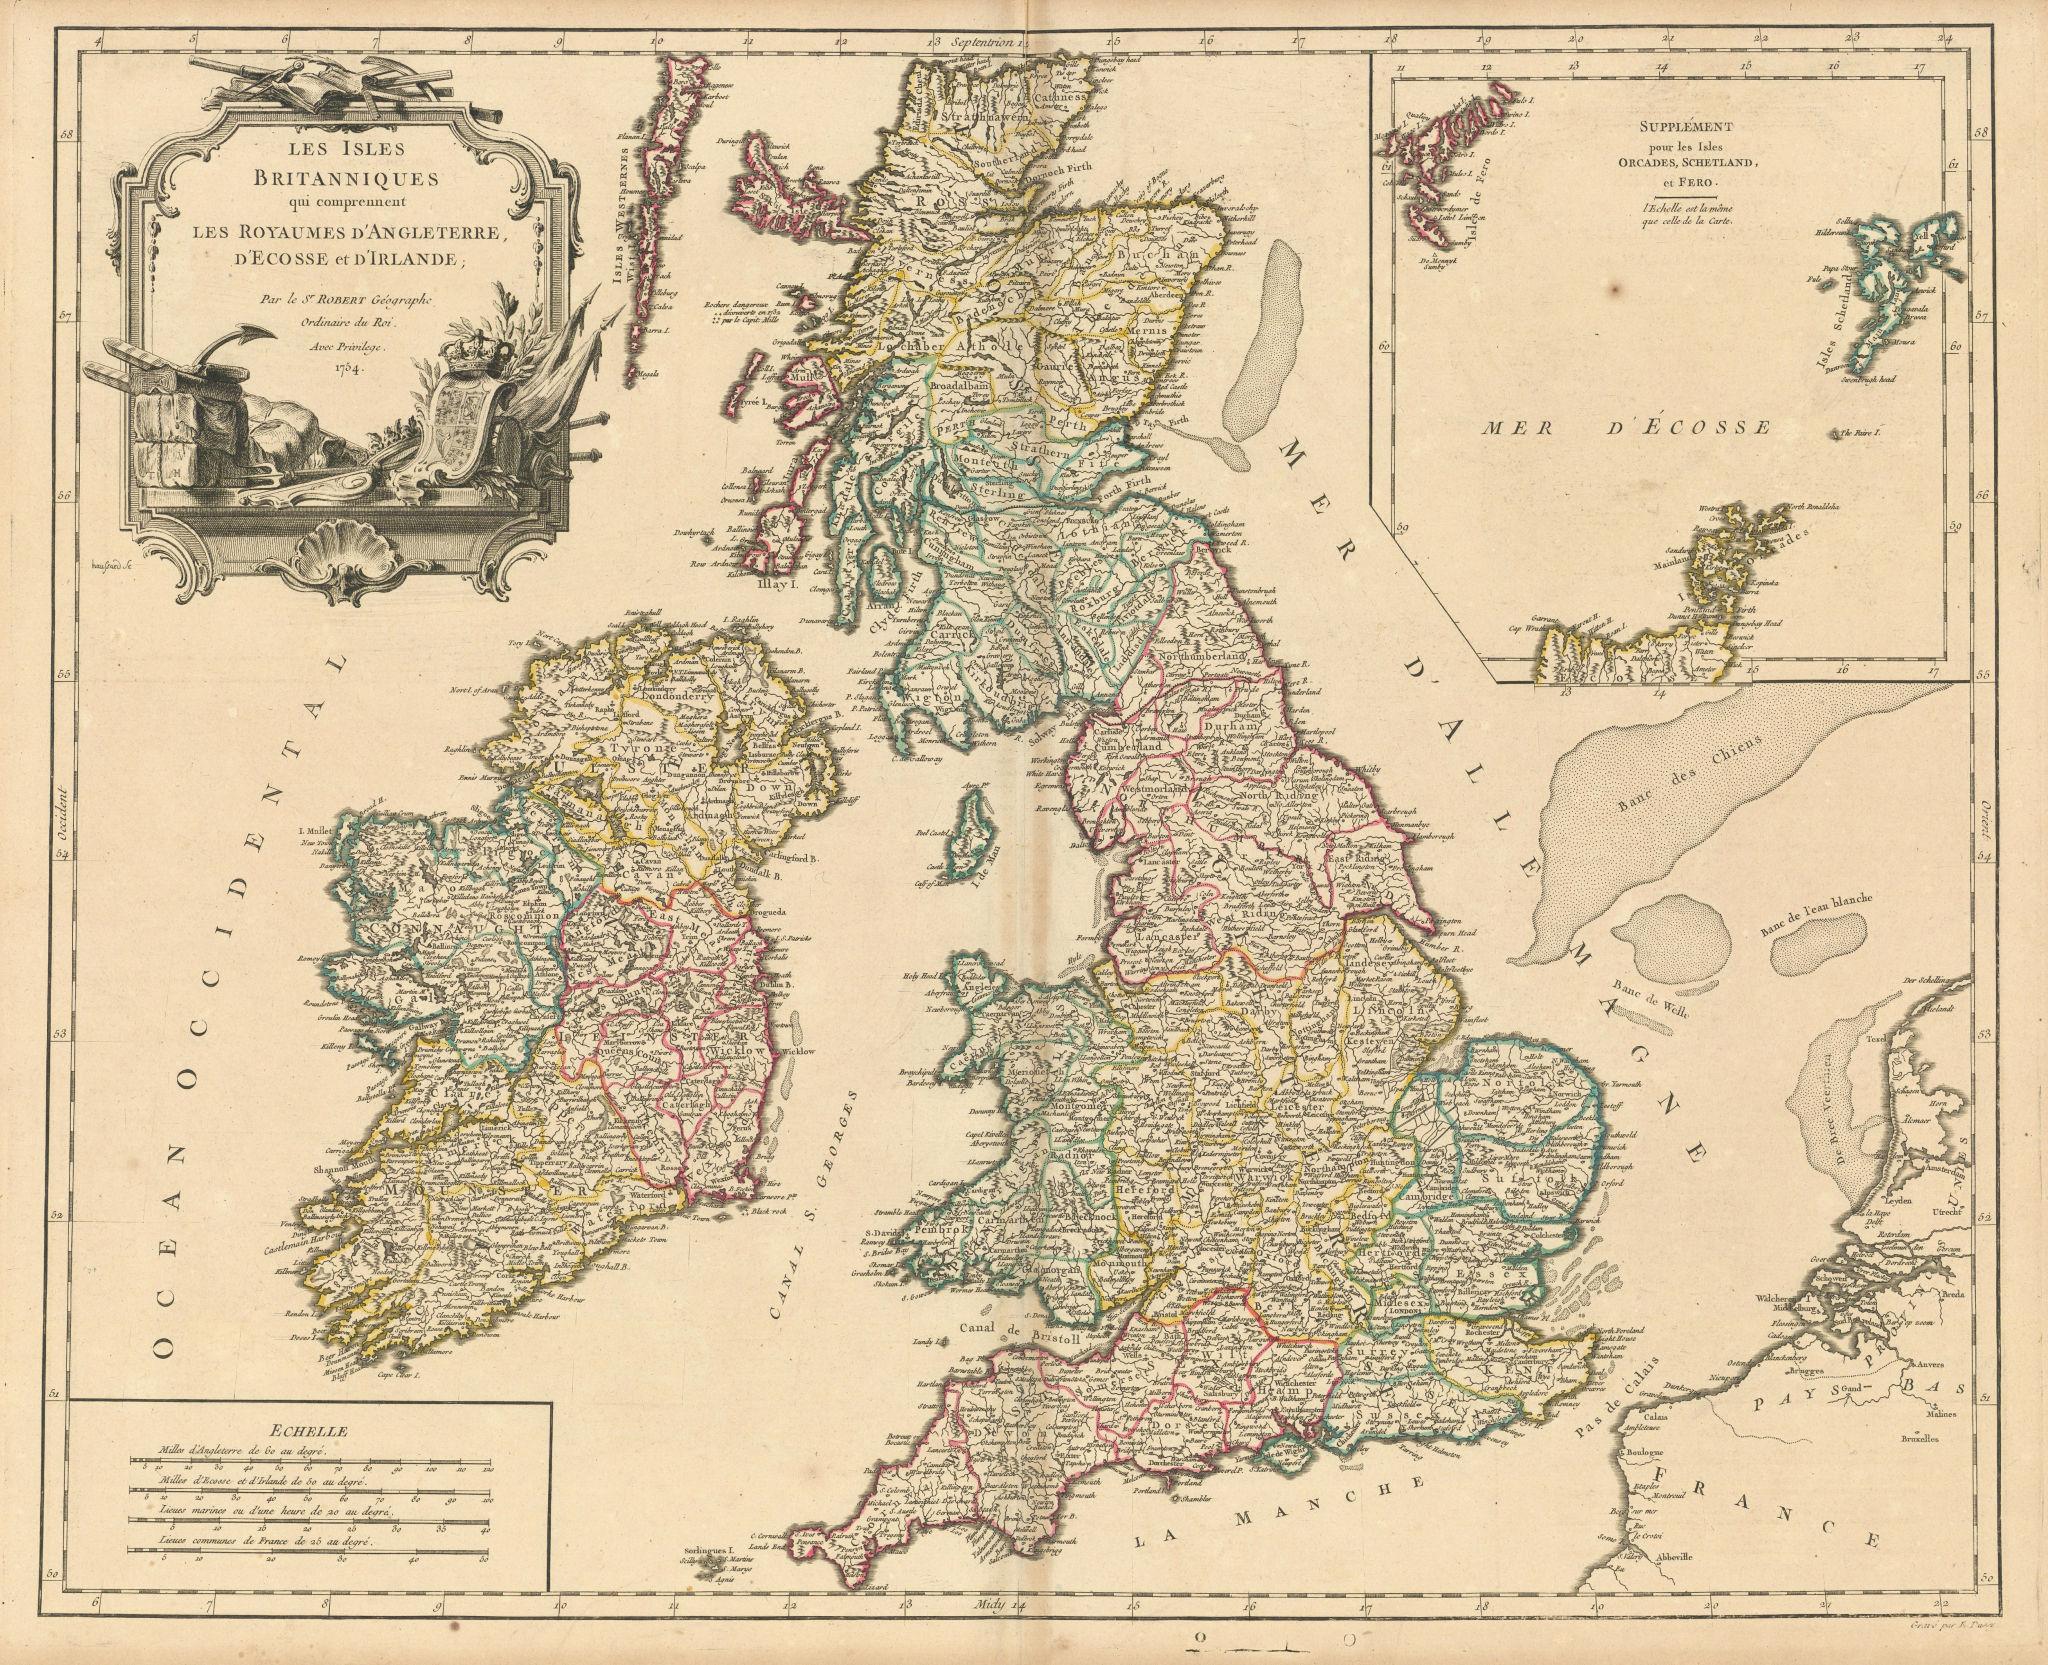 """Les Isles Britanniques qui comprennent…"" British Isles. VAUGONDY 1754 old map"